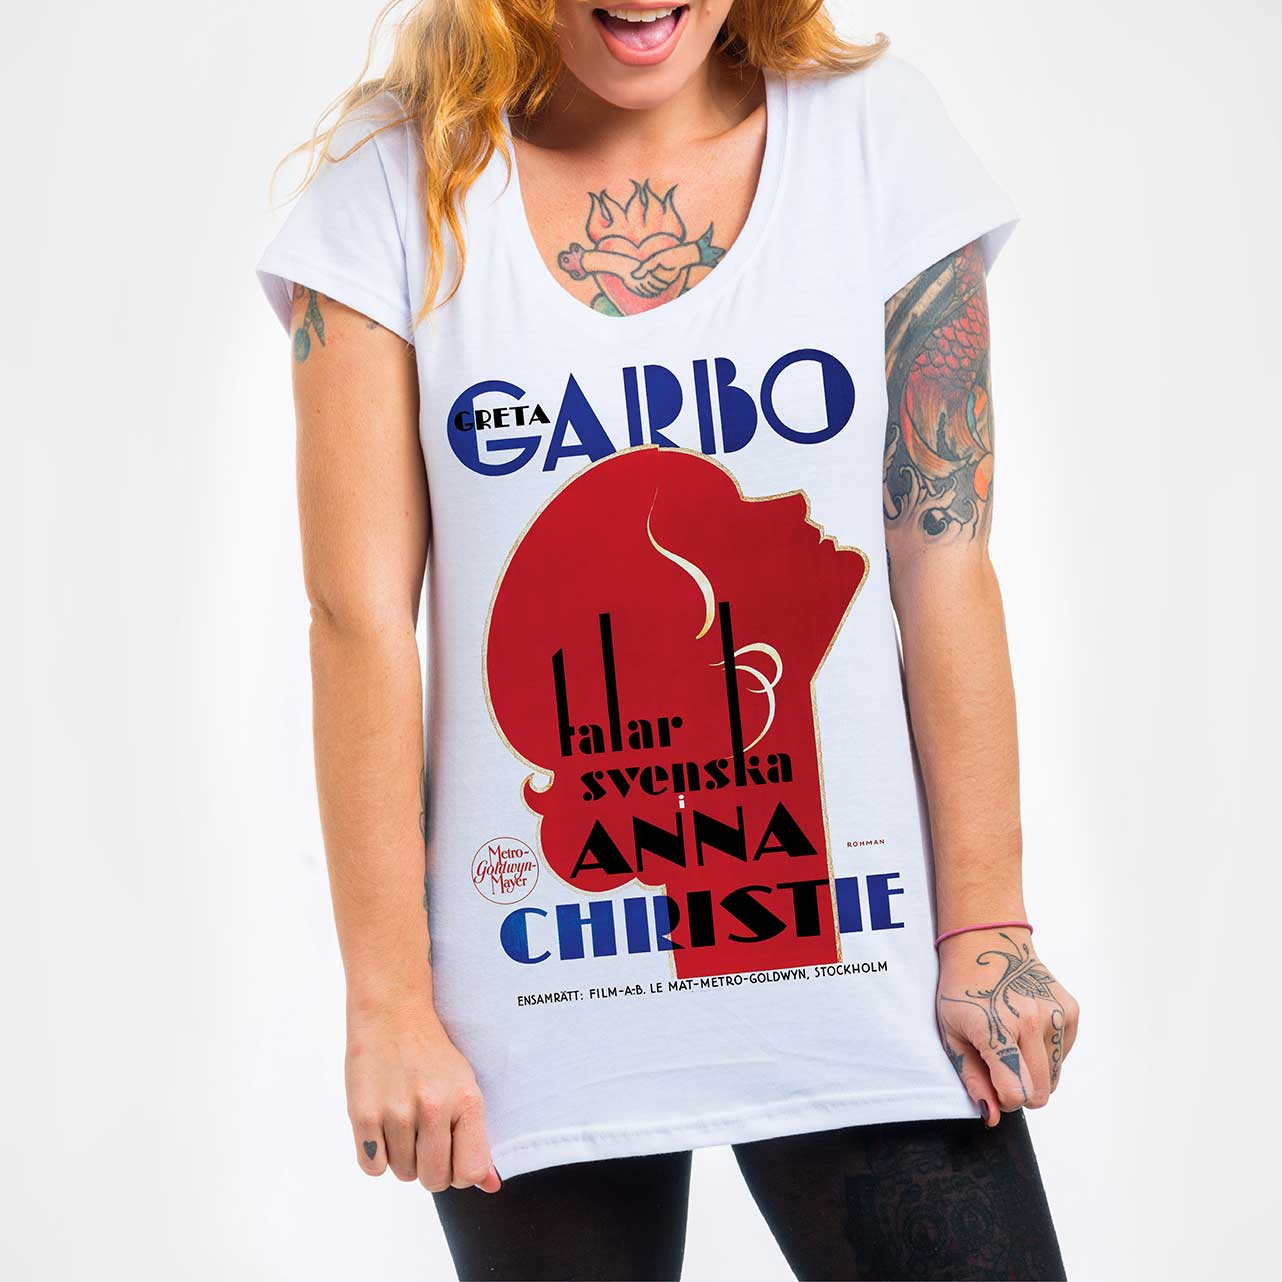 Camisa Feminina - Garbo